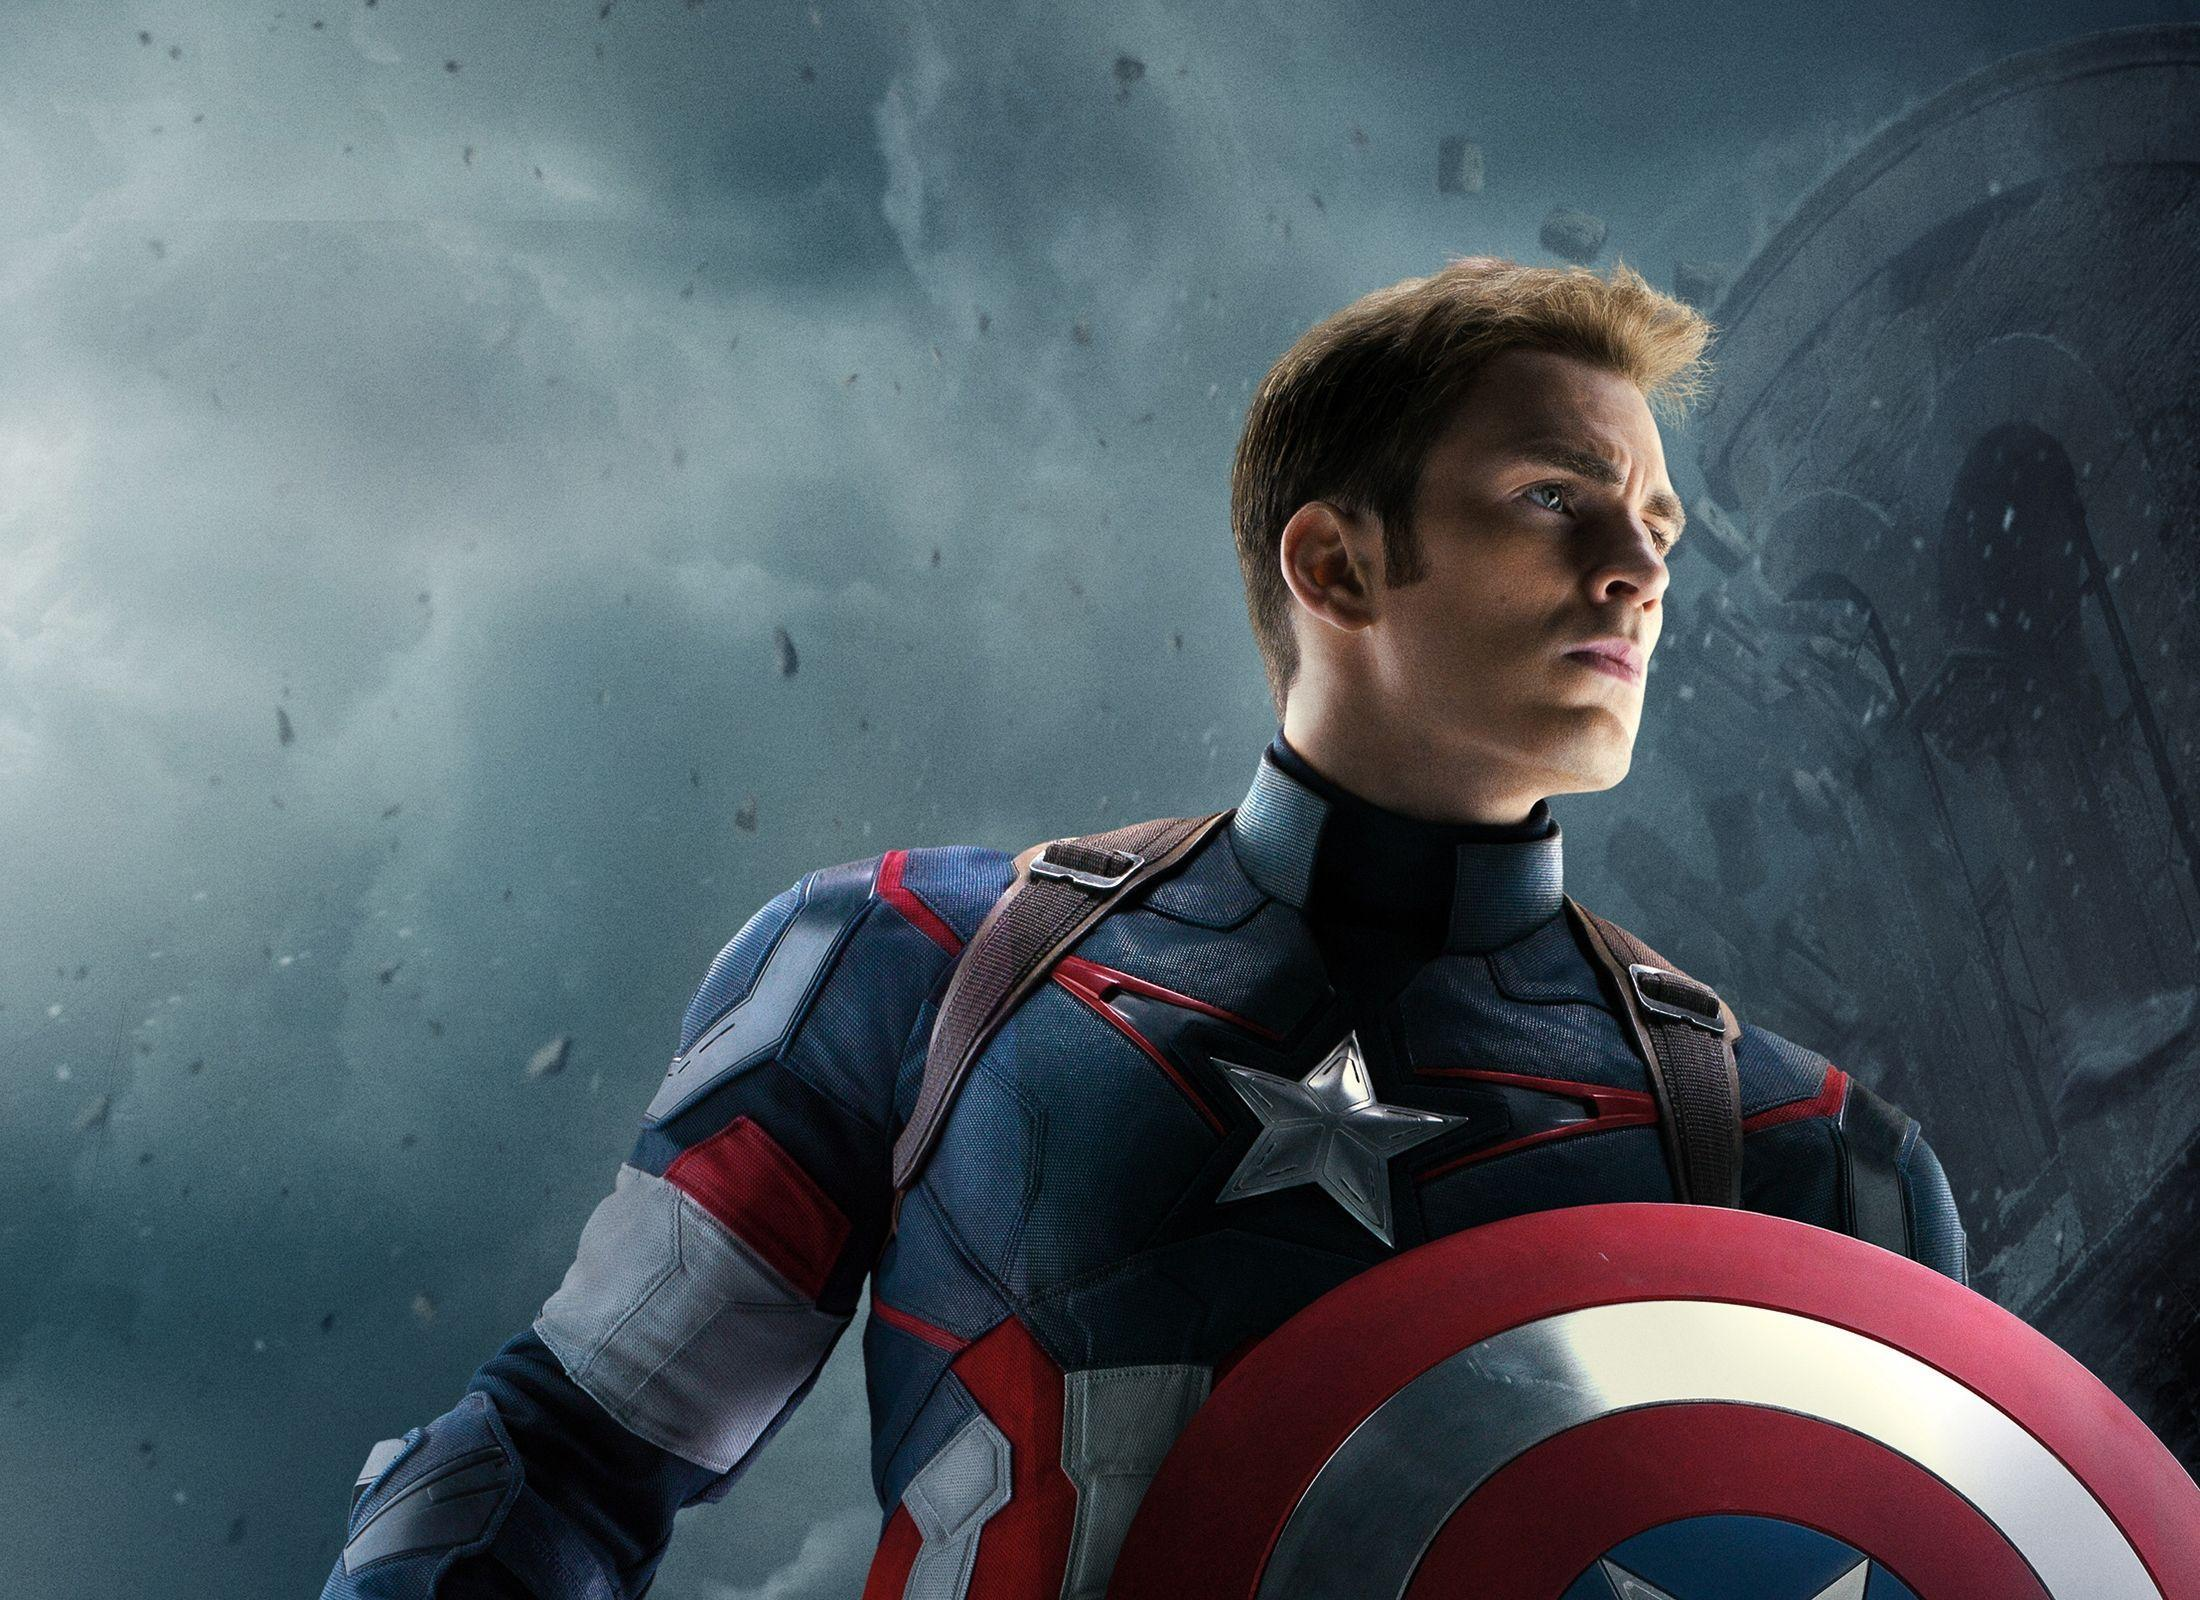 Captain America Wallpapers Wallpaper Cave